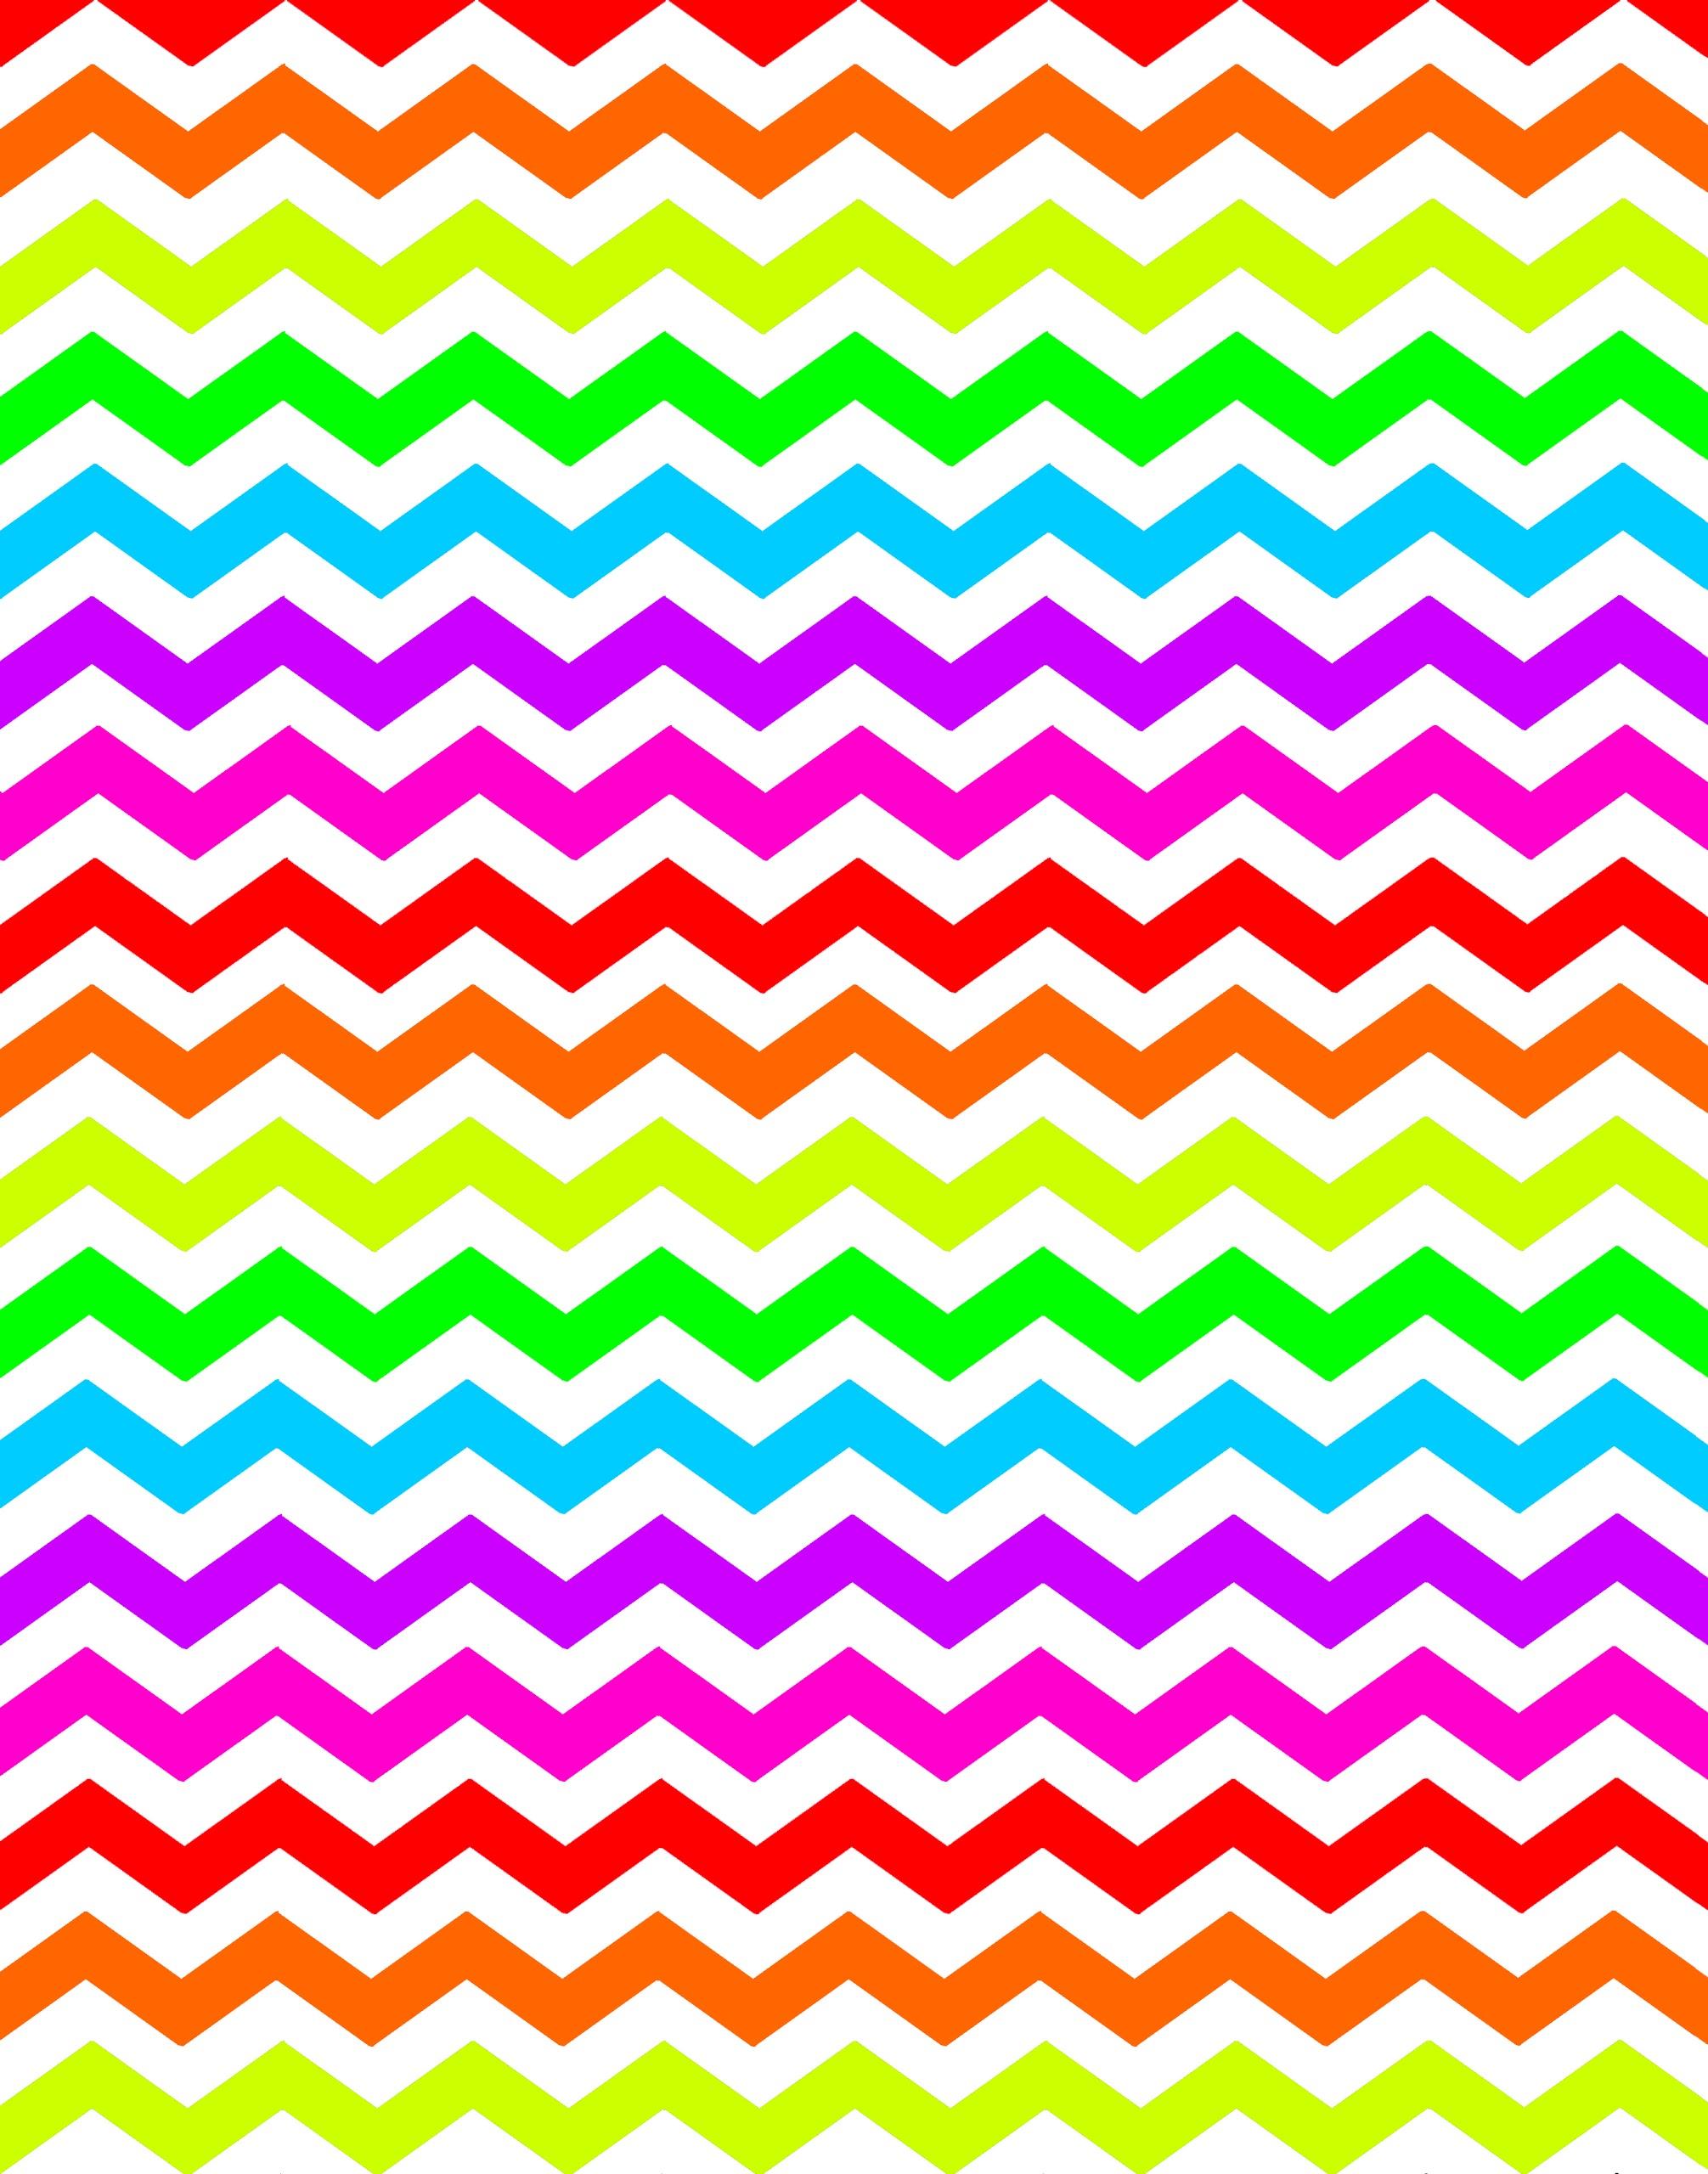 2011x2560 Neon Clipart Hd Wallpaper